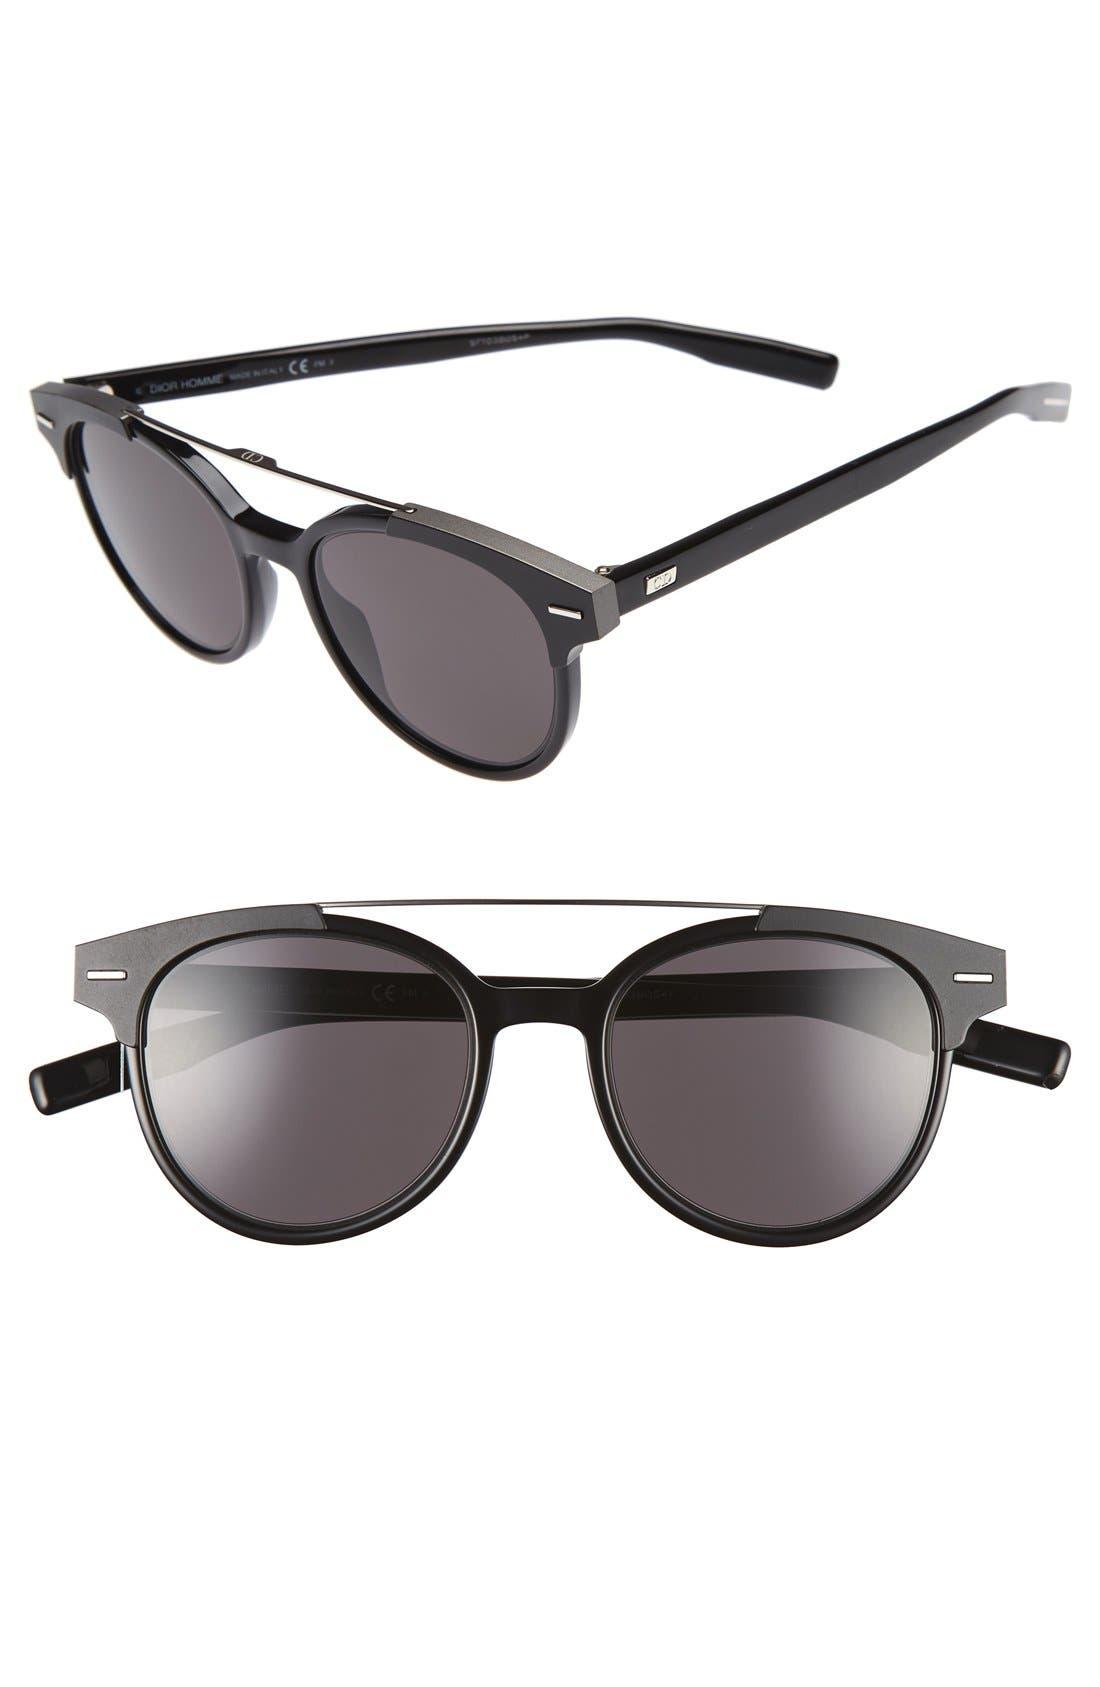 Dior 'Black Tie' 51mm Sunglasses